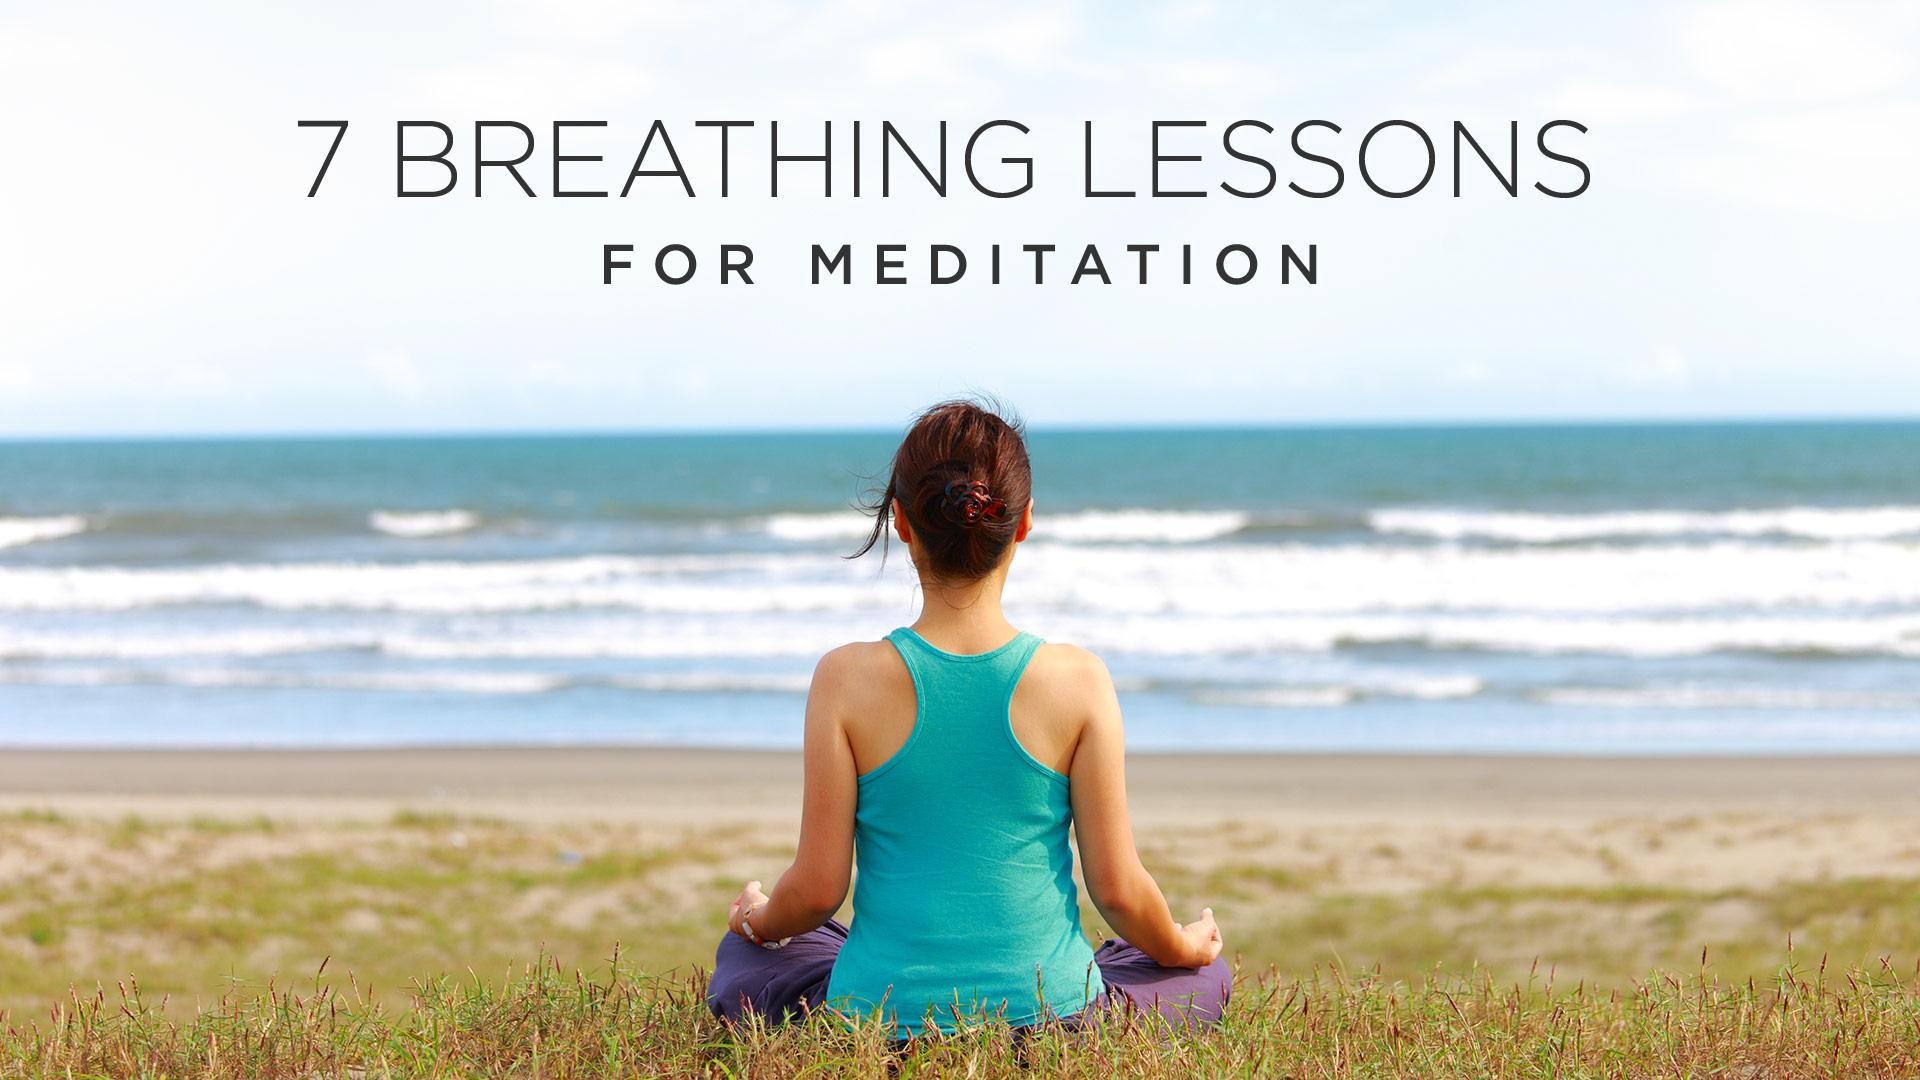 7 Breathing Lessons for Meditation | Yoga International